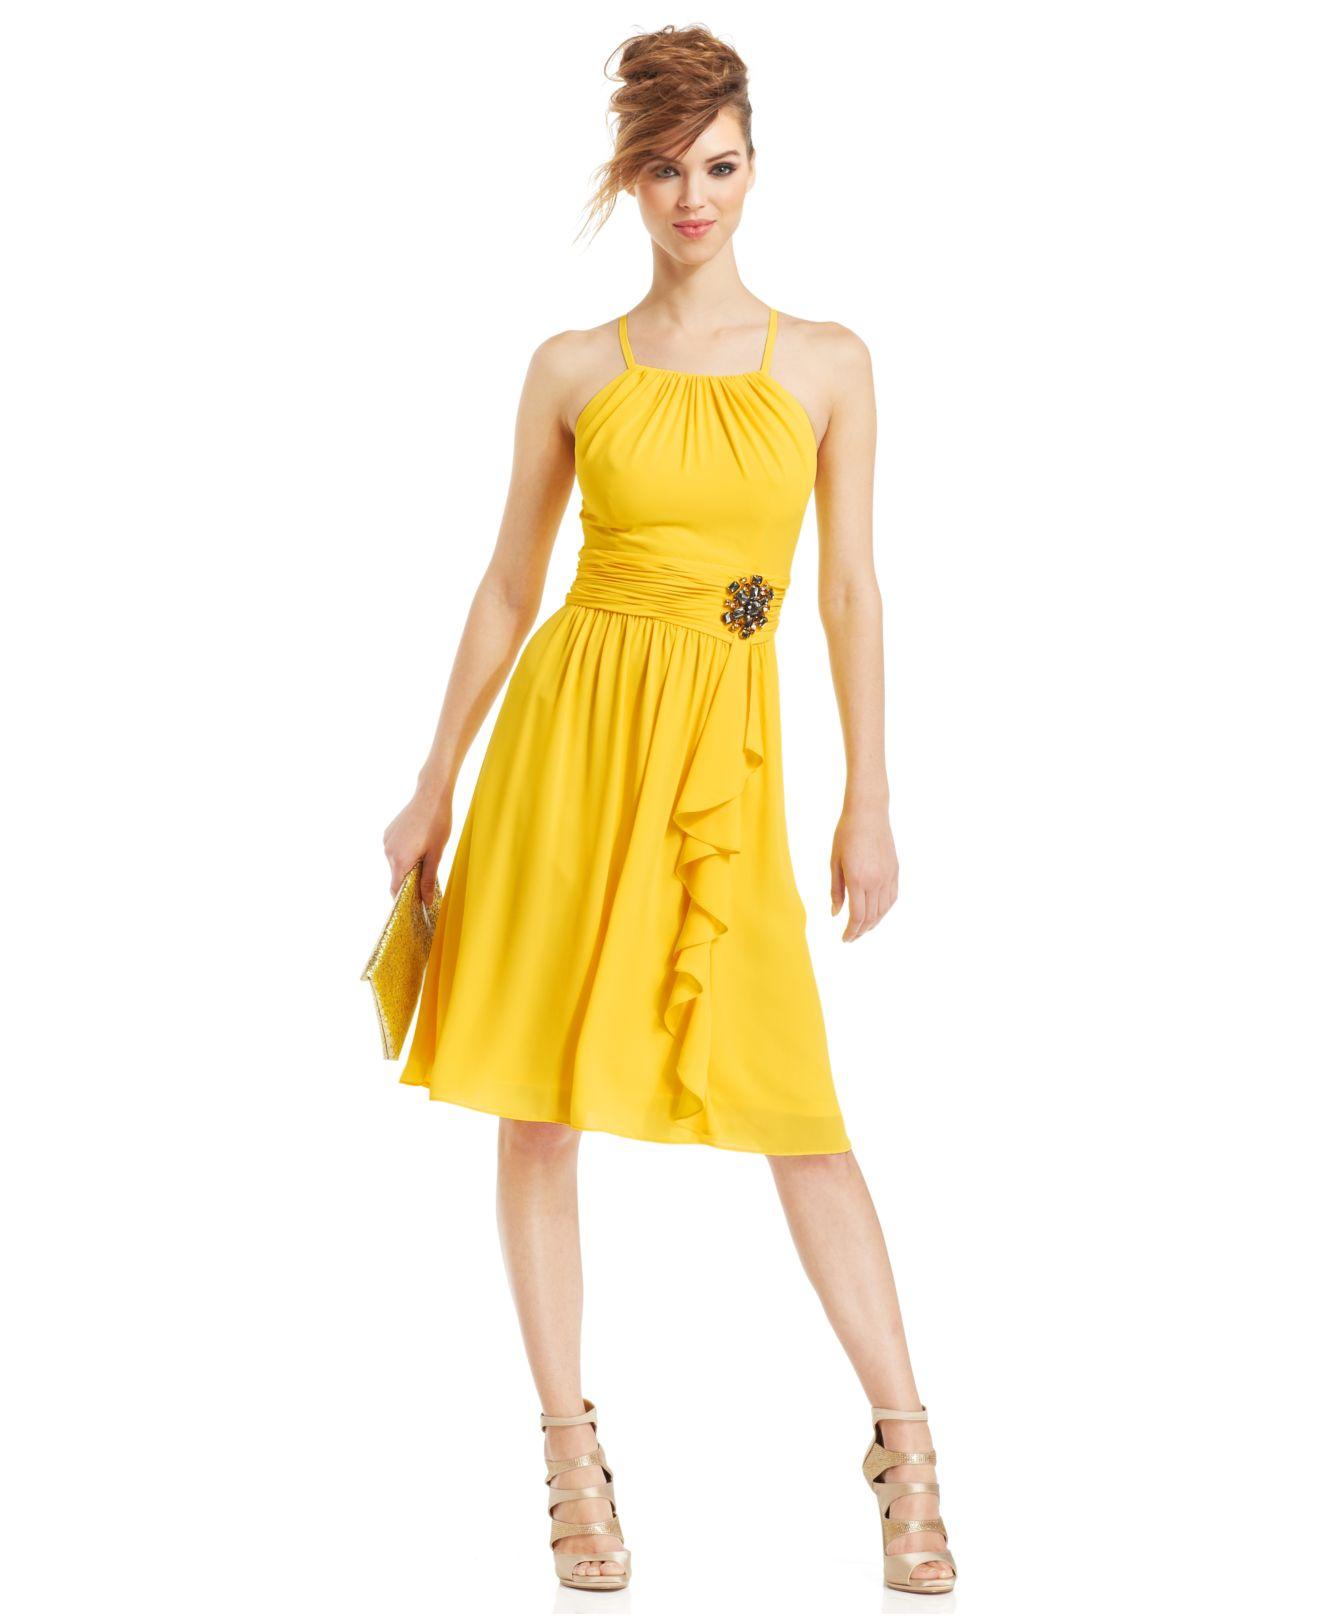 Lyst - Nine West Halter Crisscross-Back Cocktail Dress in Yellow